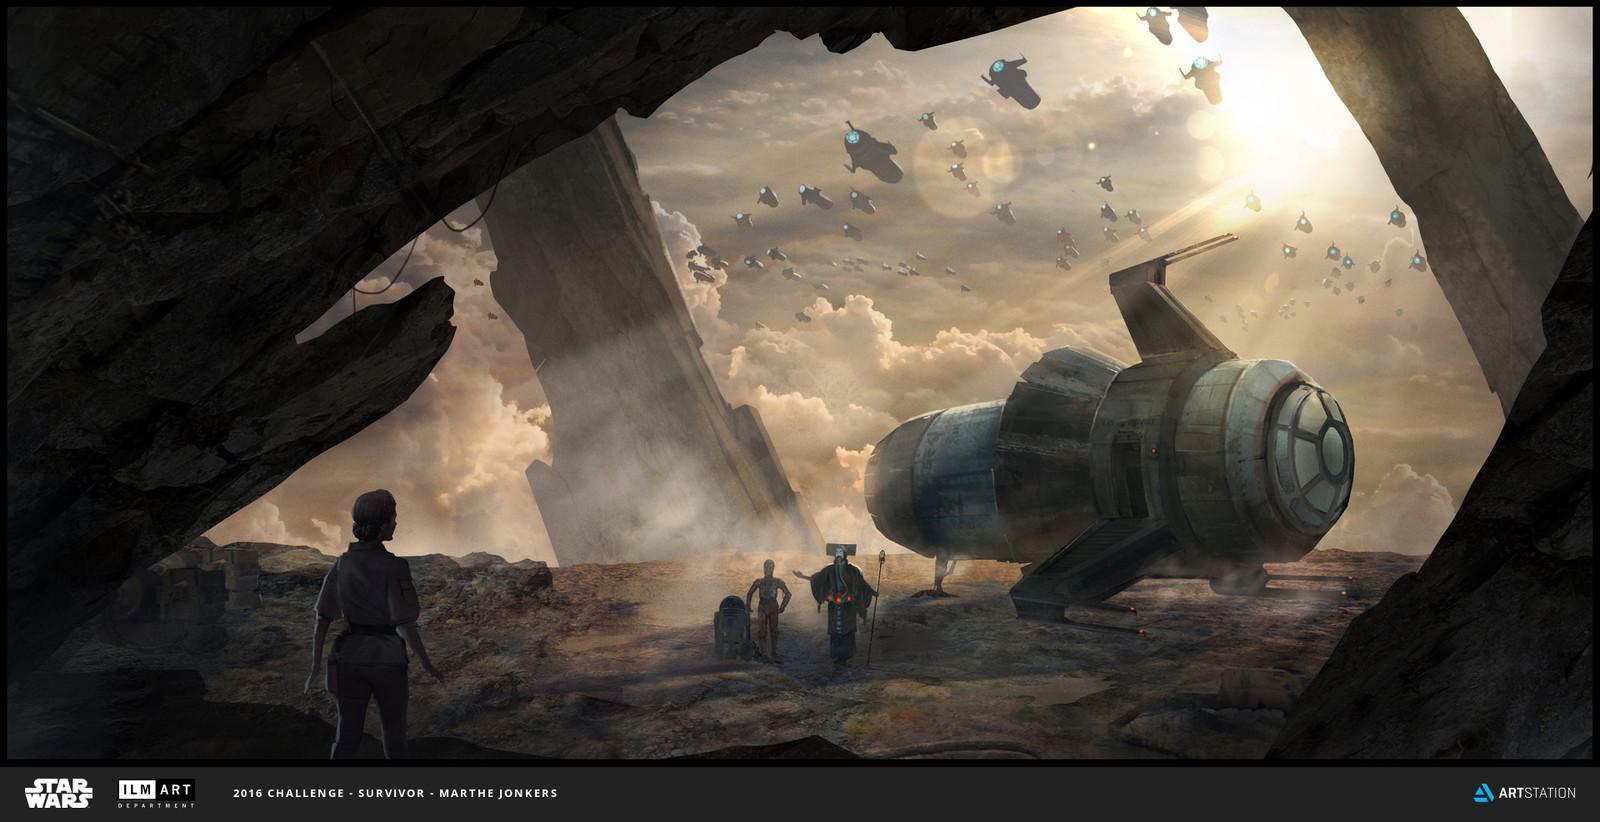 ILM Art Challenge: Danji Arrival